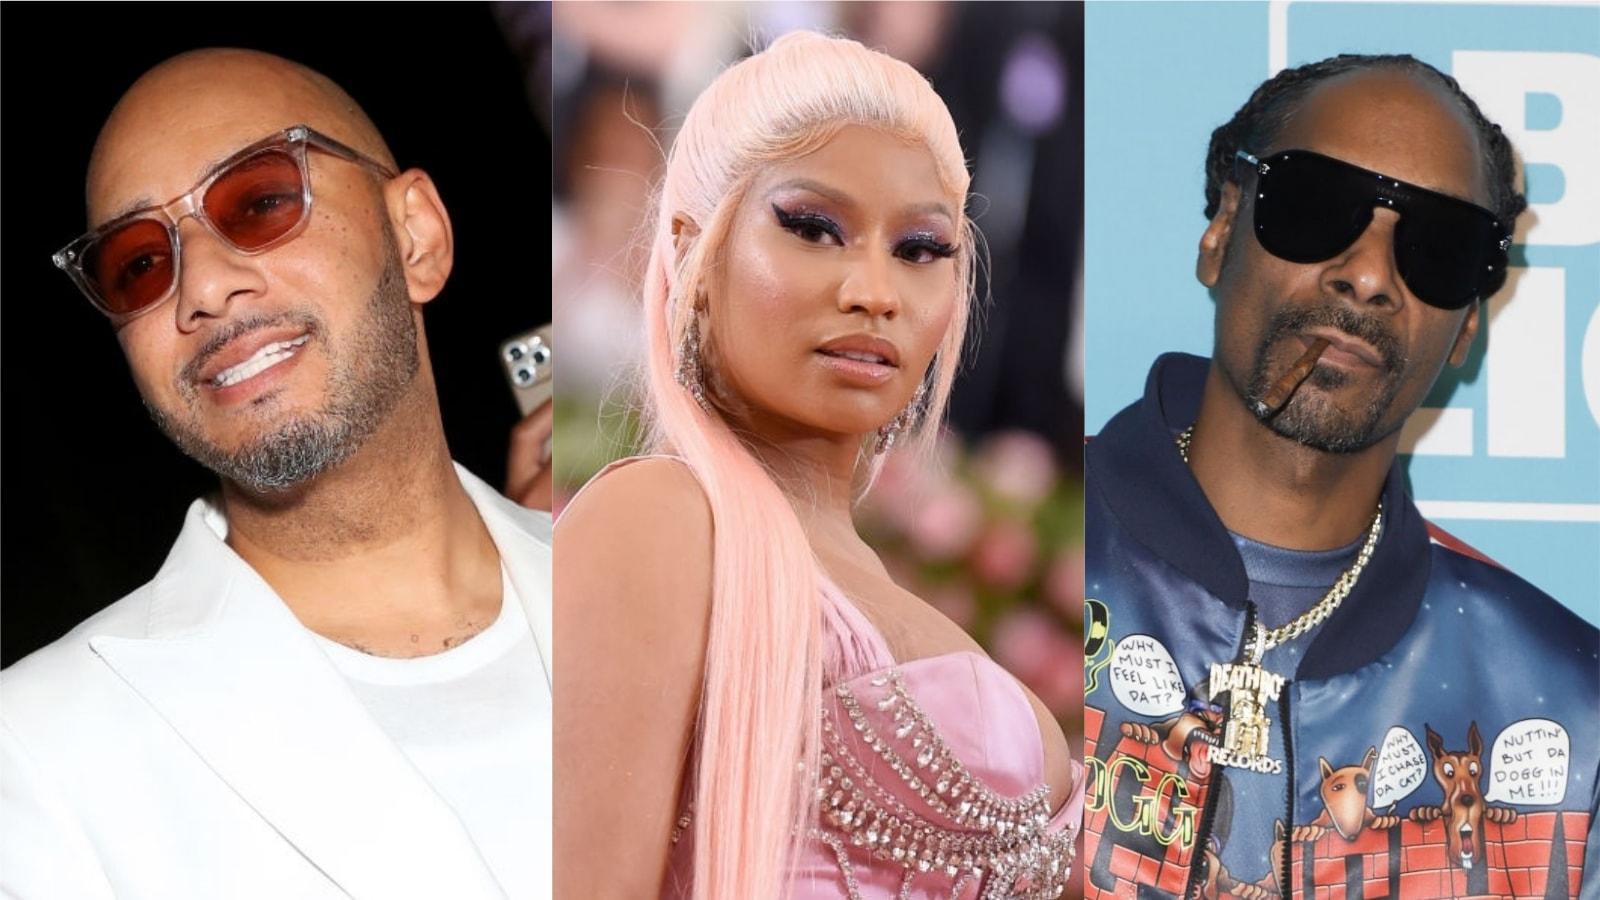 10 Hip-Hop Artists Who've Made Big Bank Outside Of Music